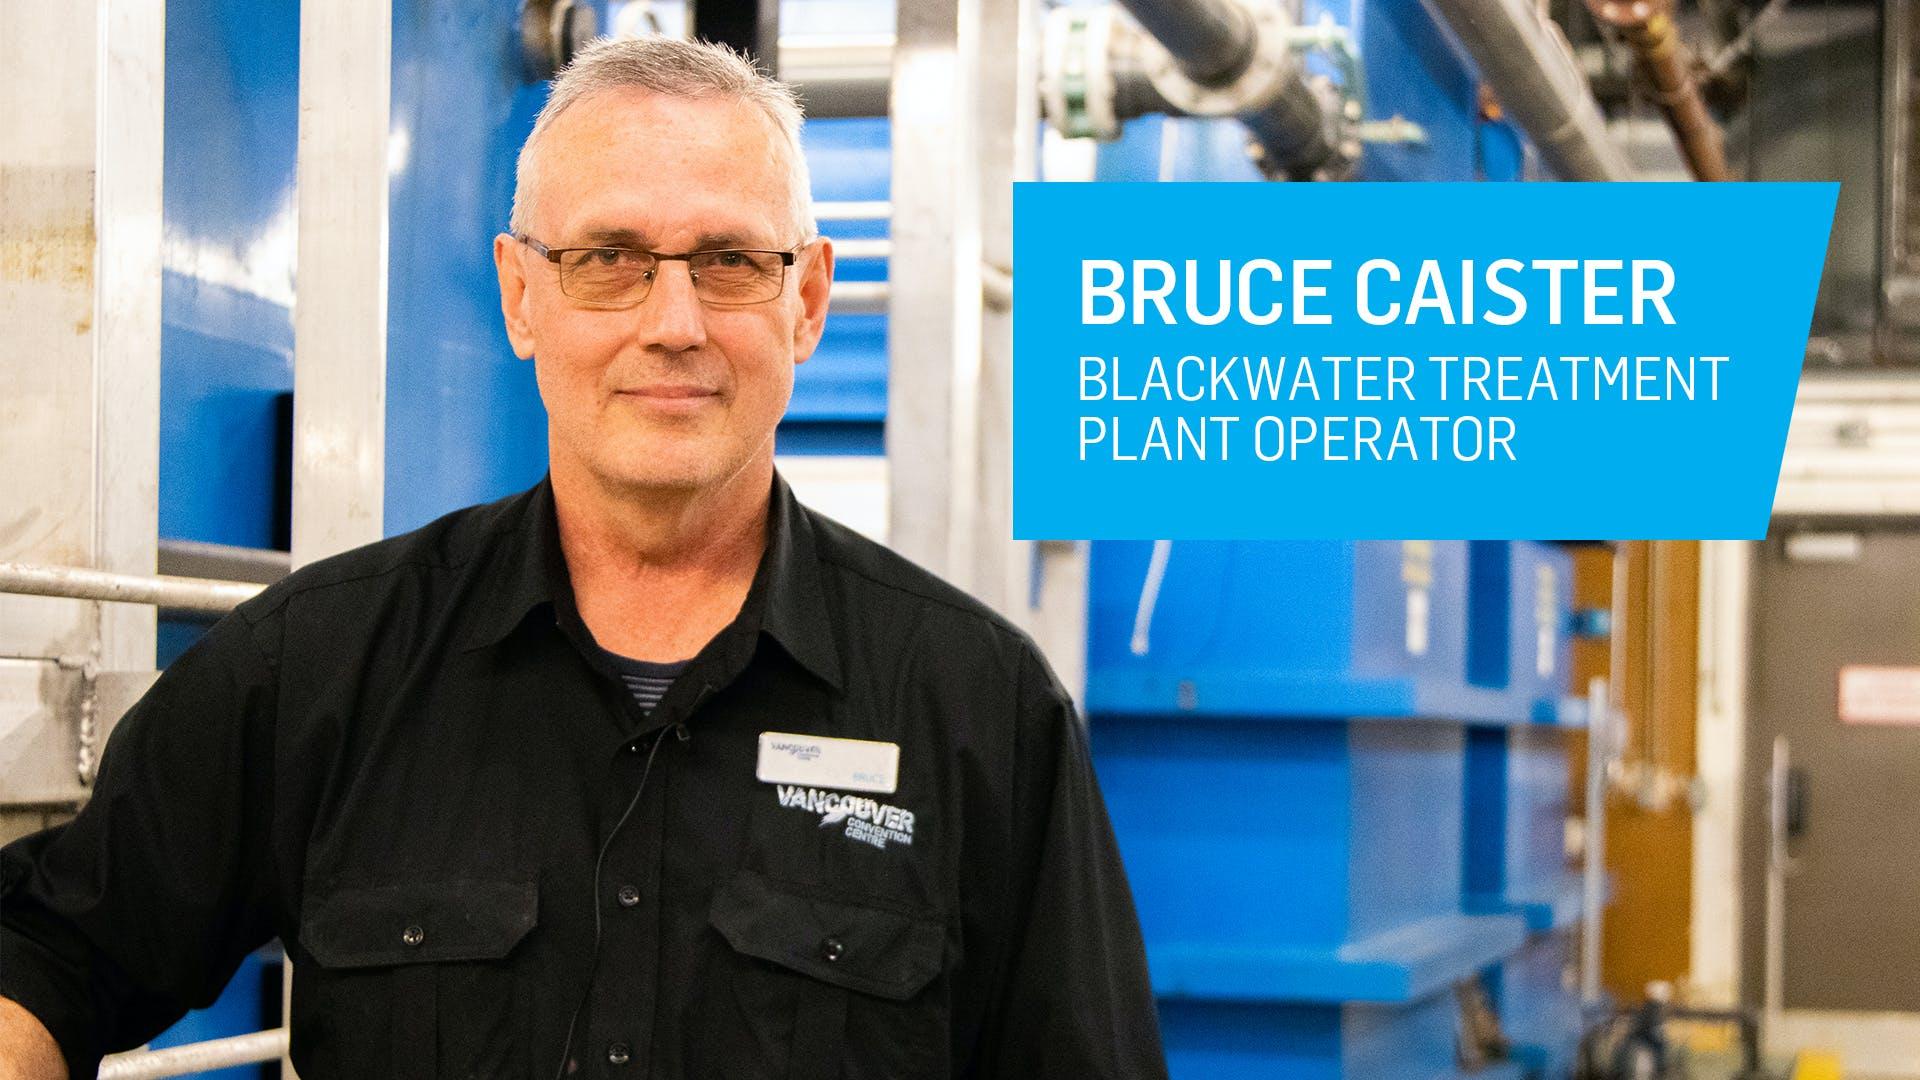 Bruce Caister: Blackwater Treatment Operator